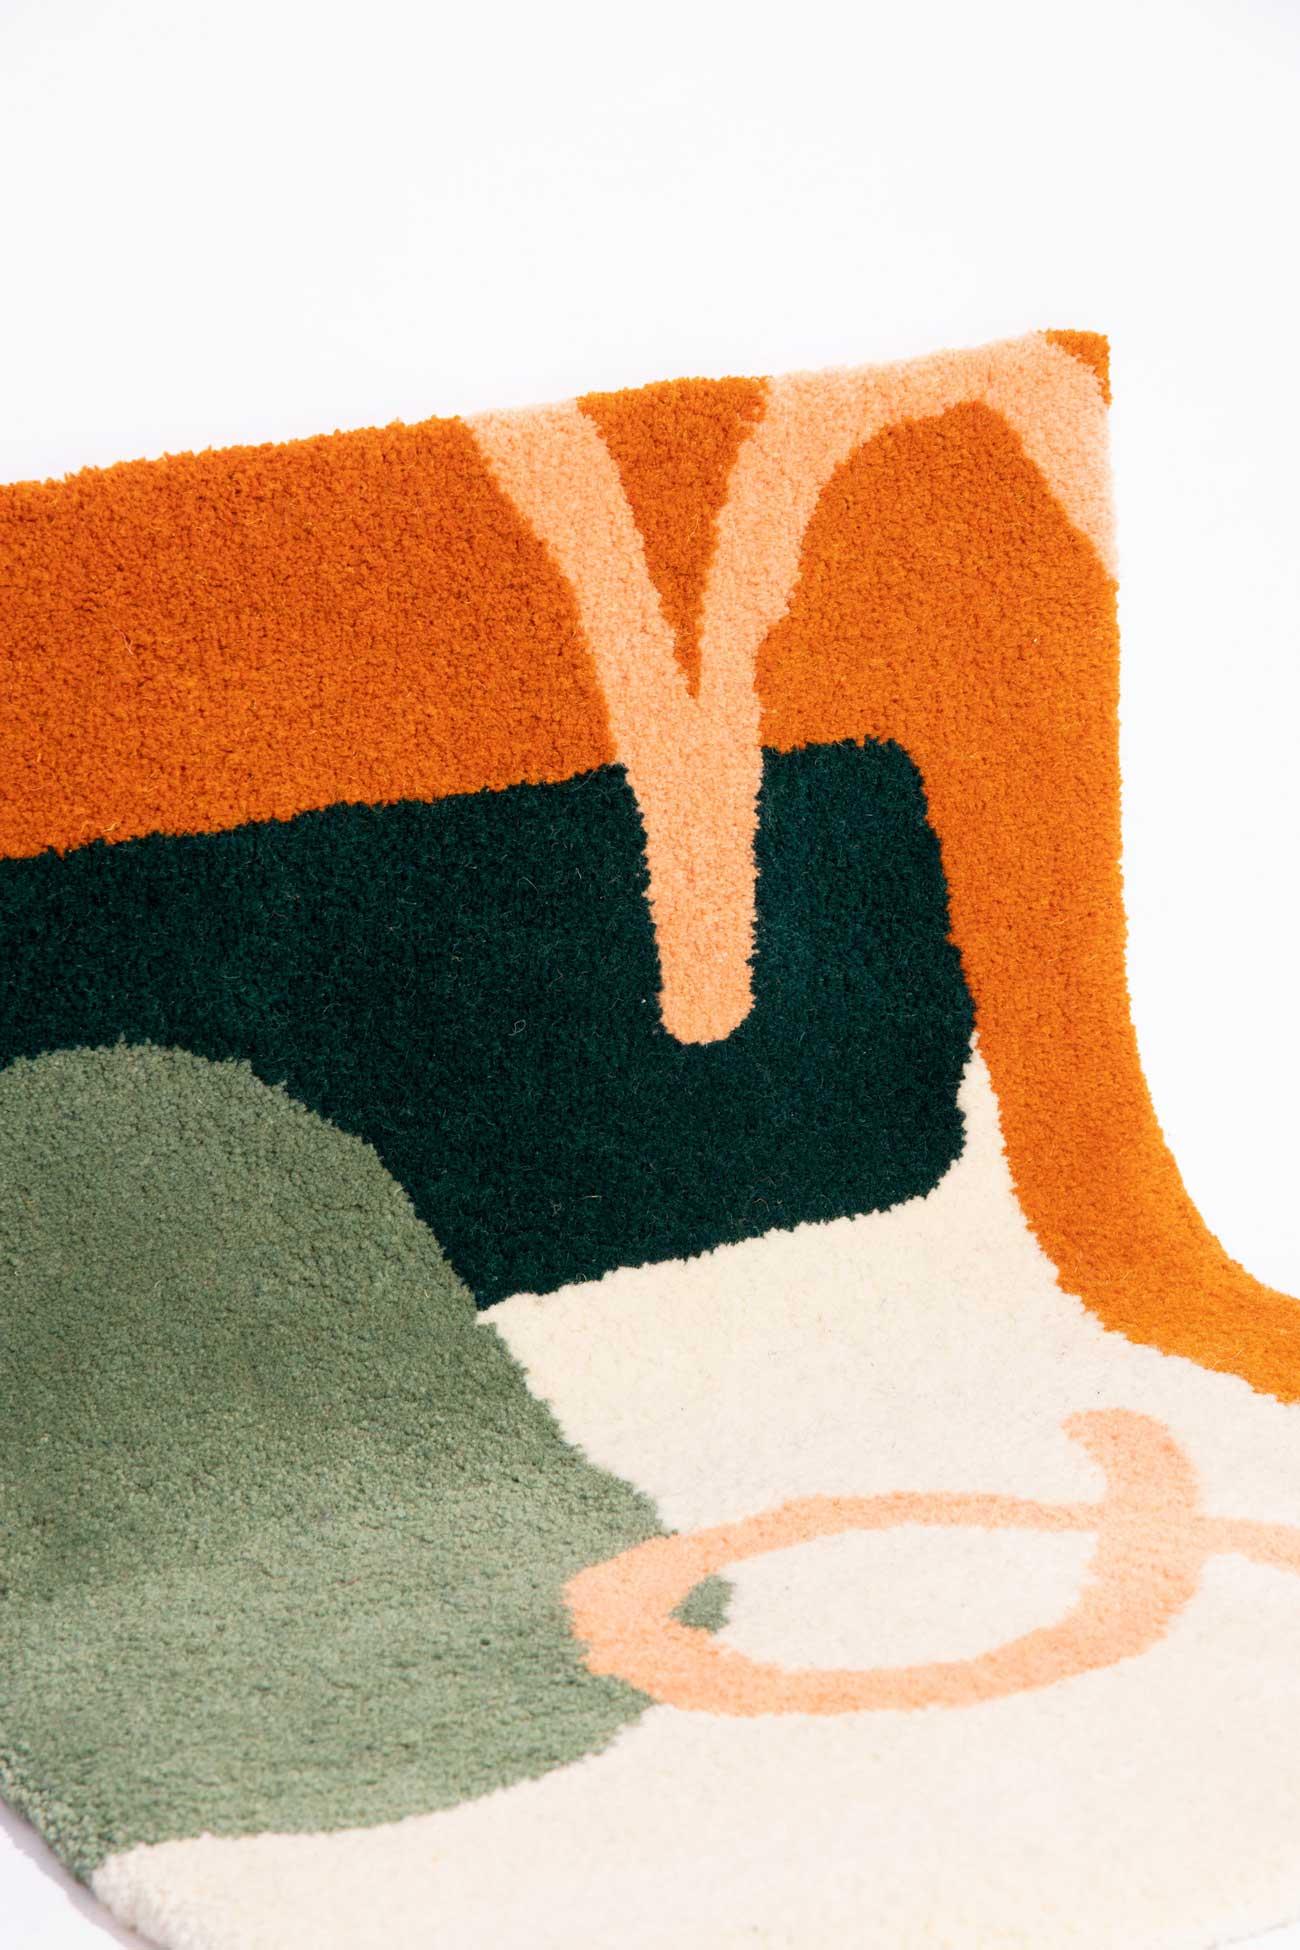 studio mirte van kooten small hand tufted sunup rug 04